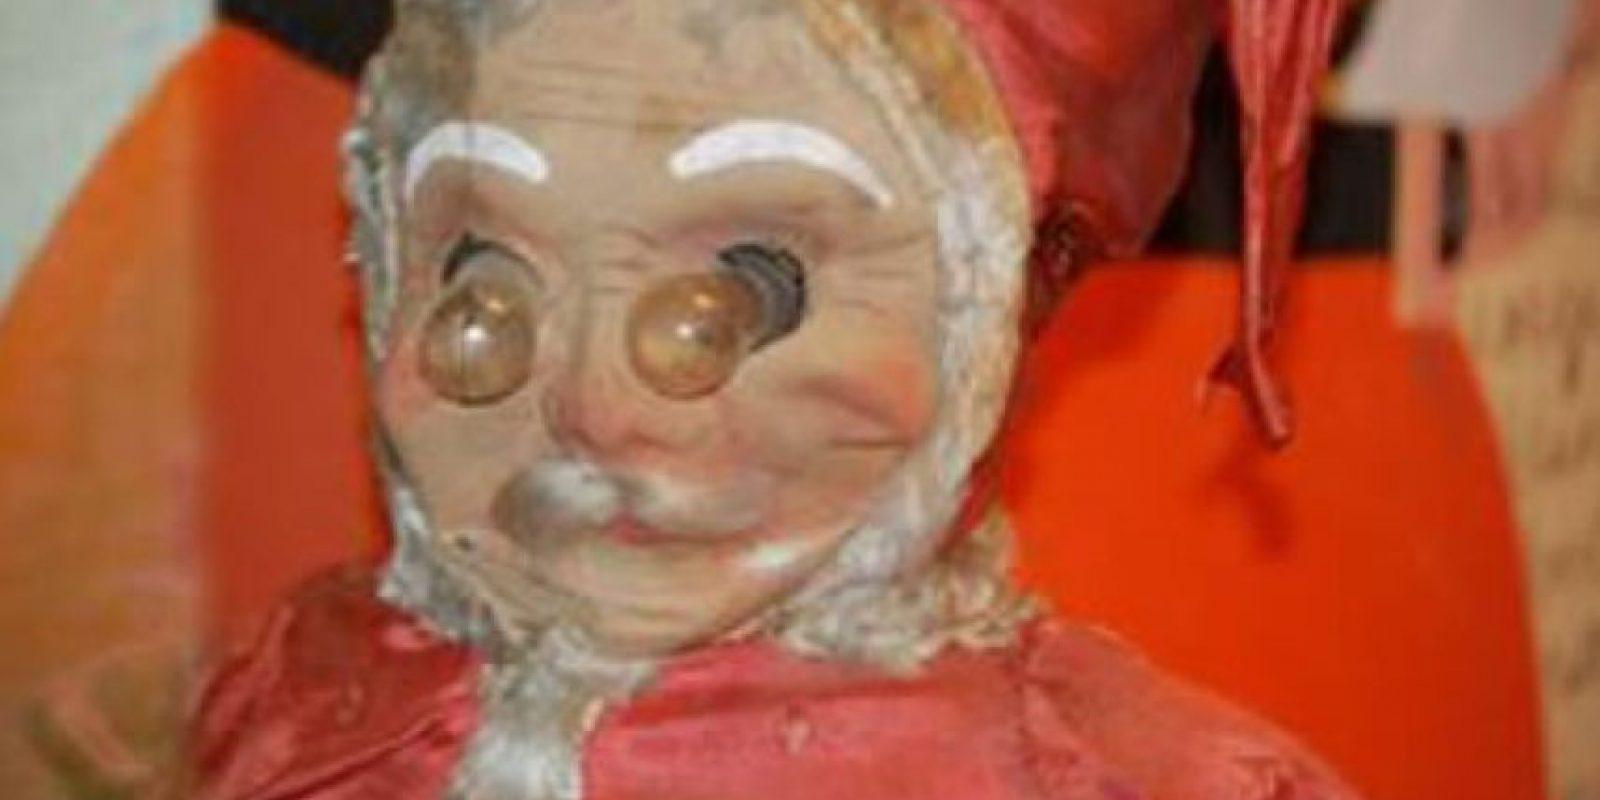 Santa ya no ve bien Foto:Oddee